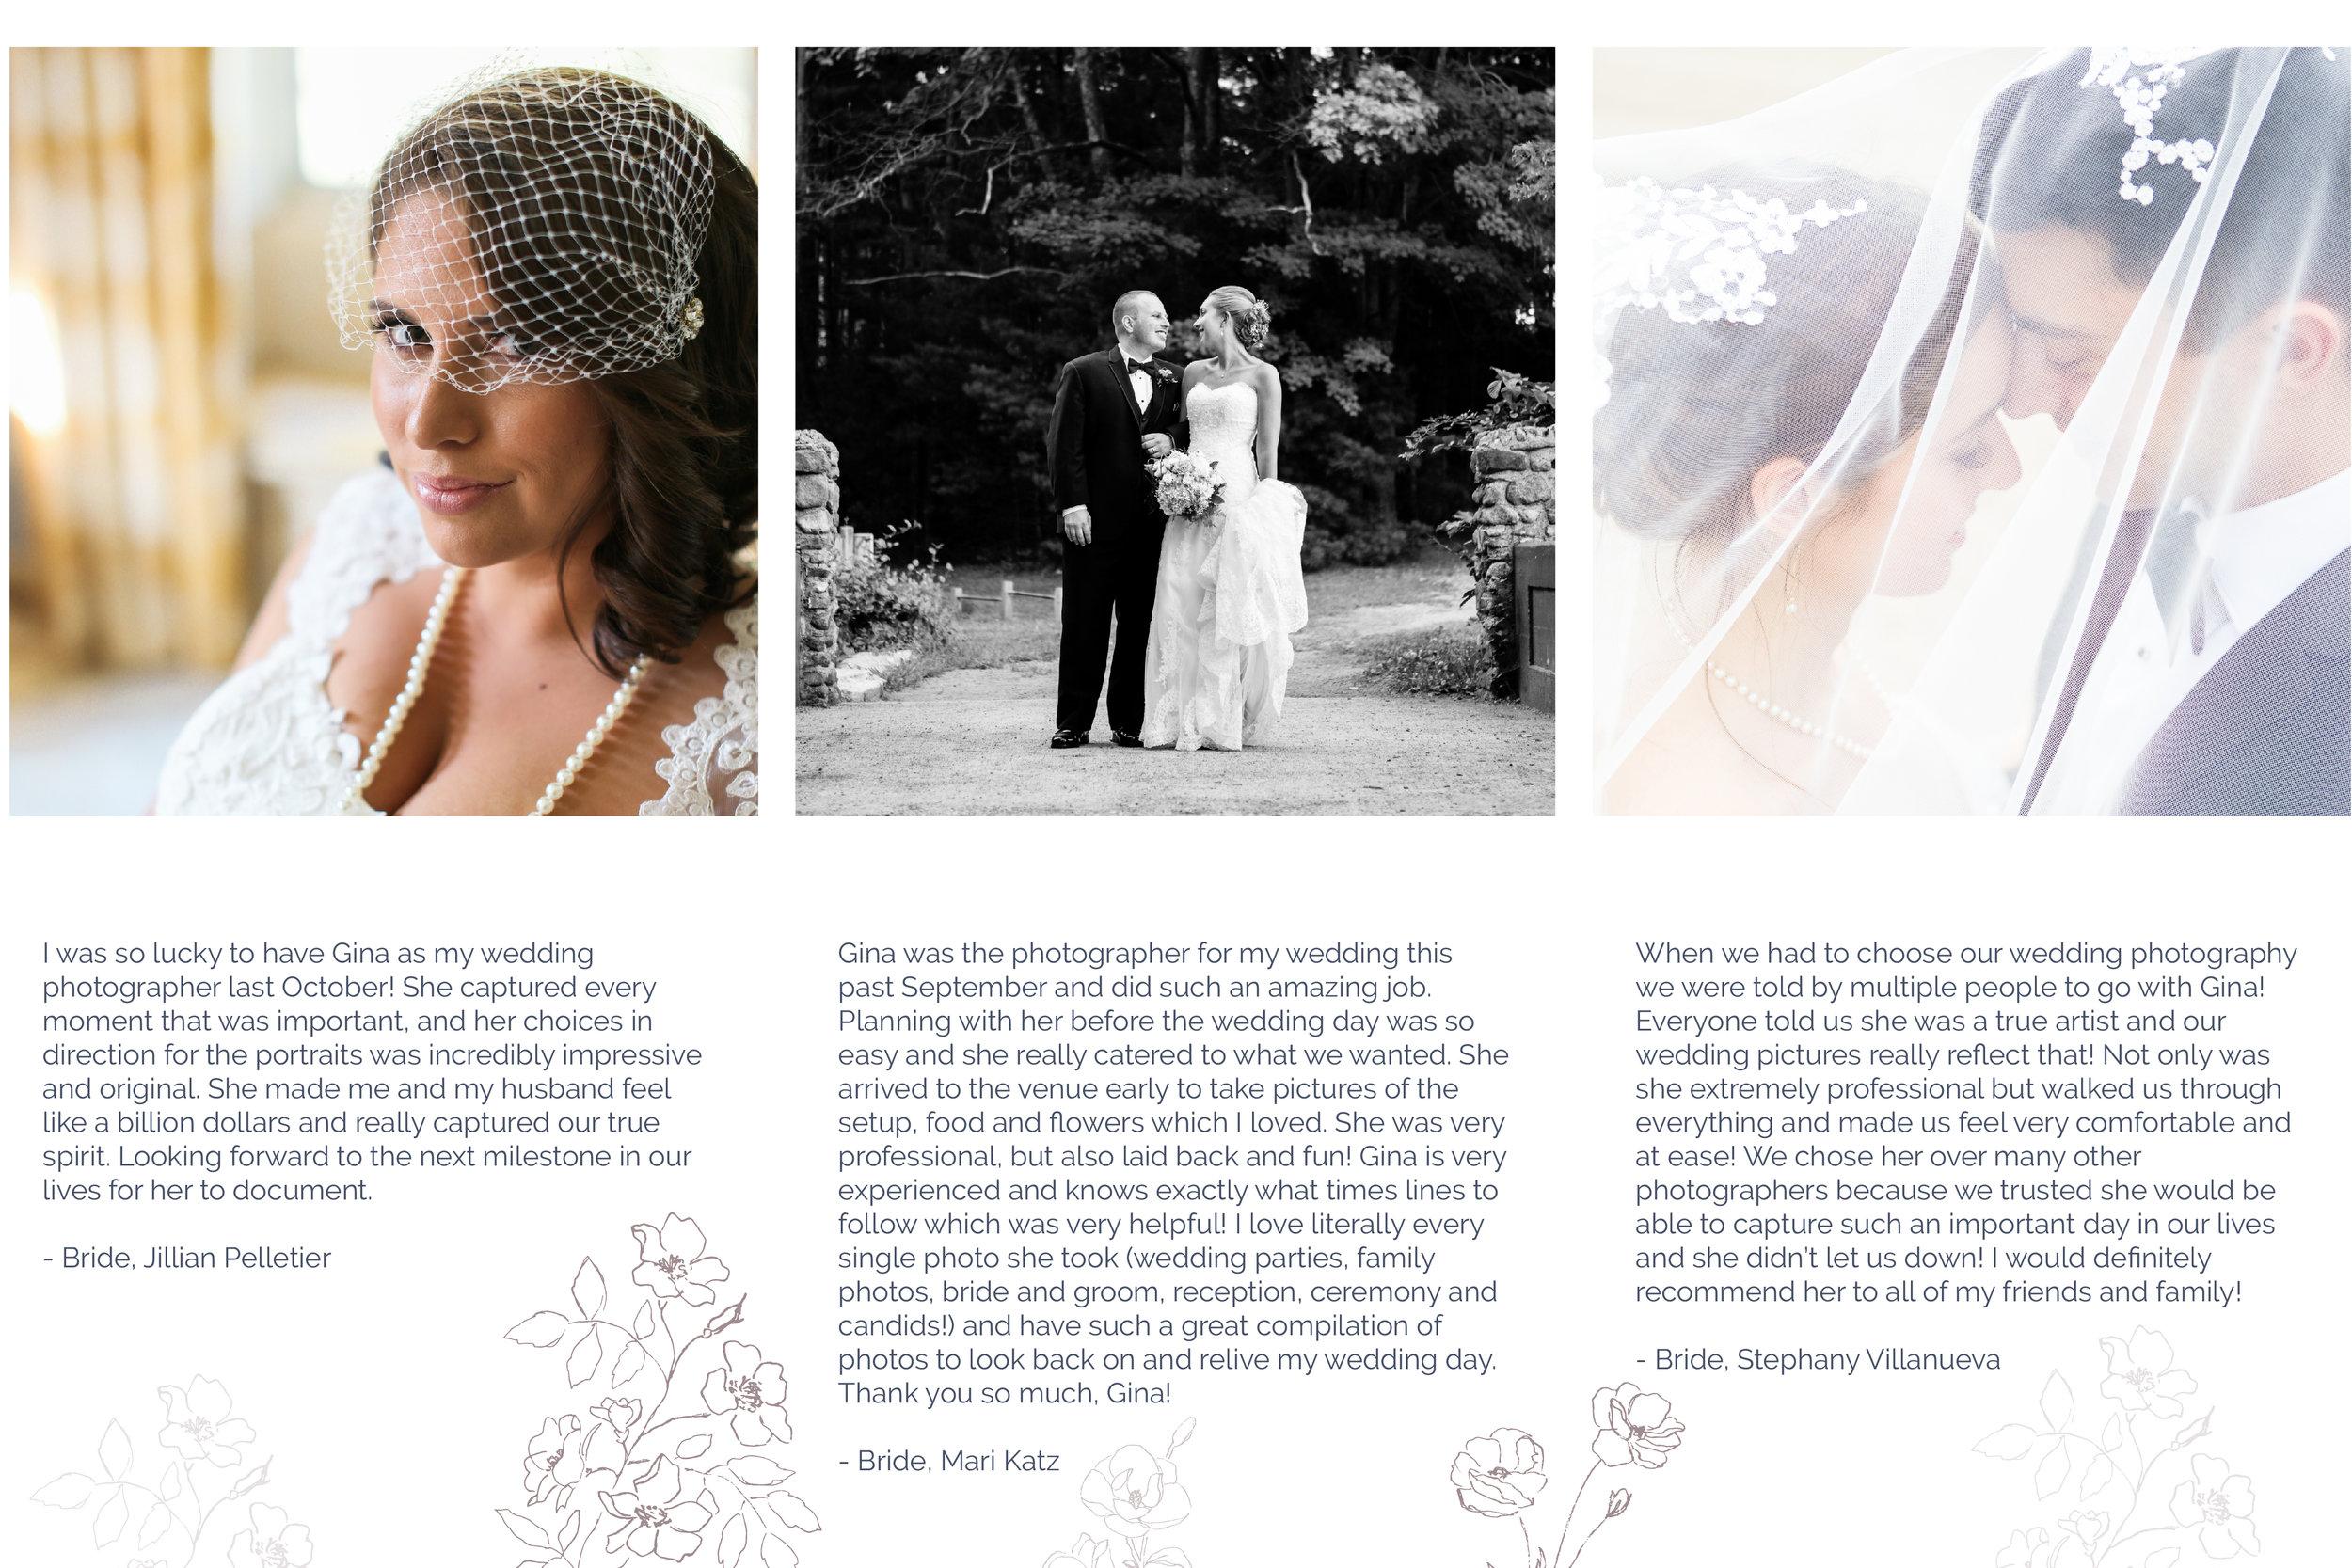 Gina-Testimonials-3-web.jpg